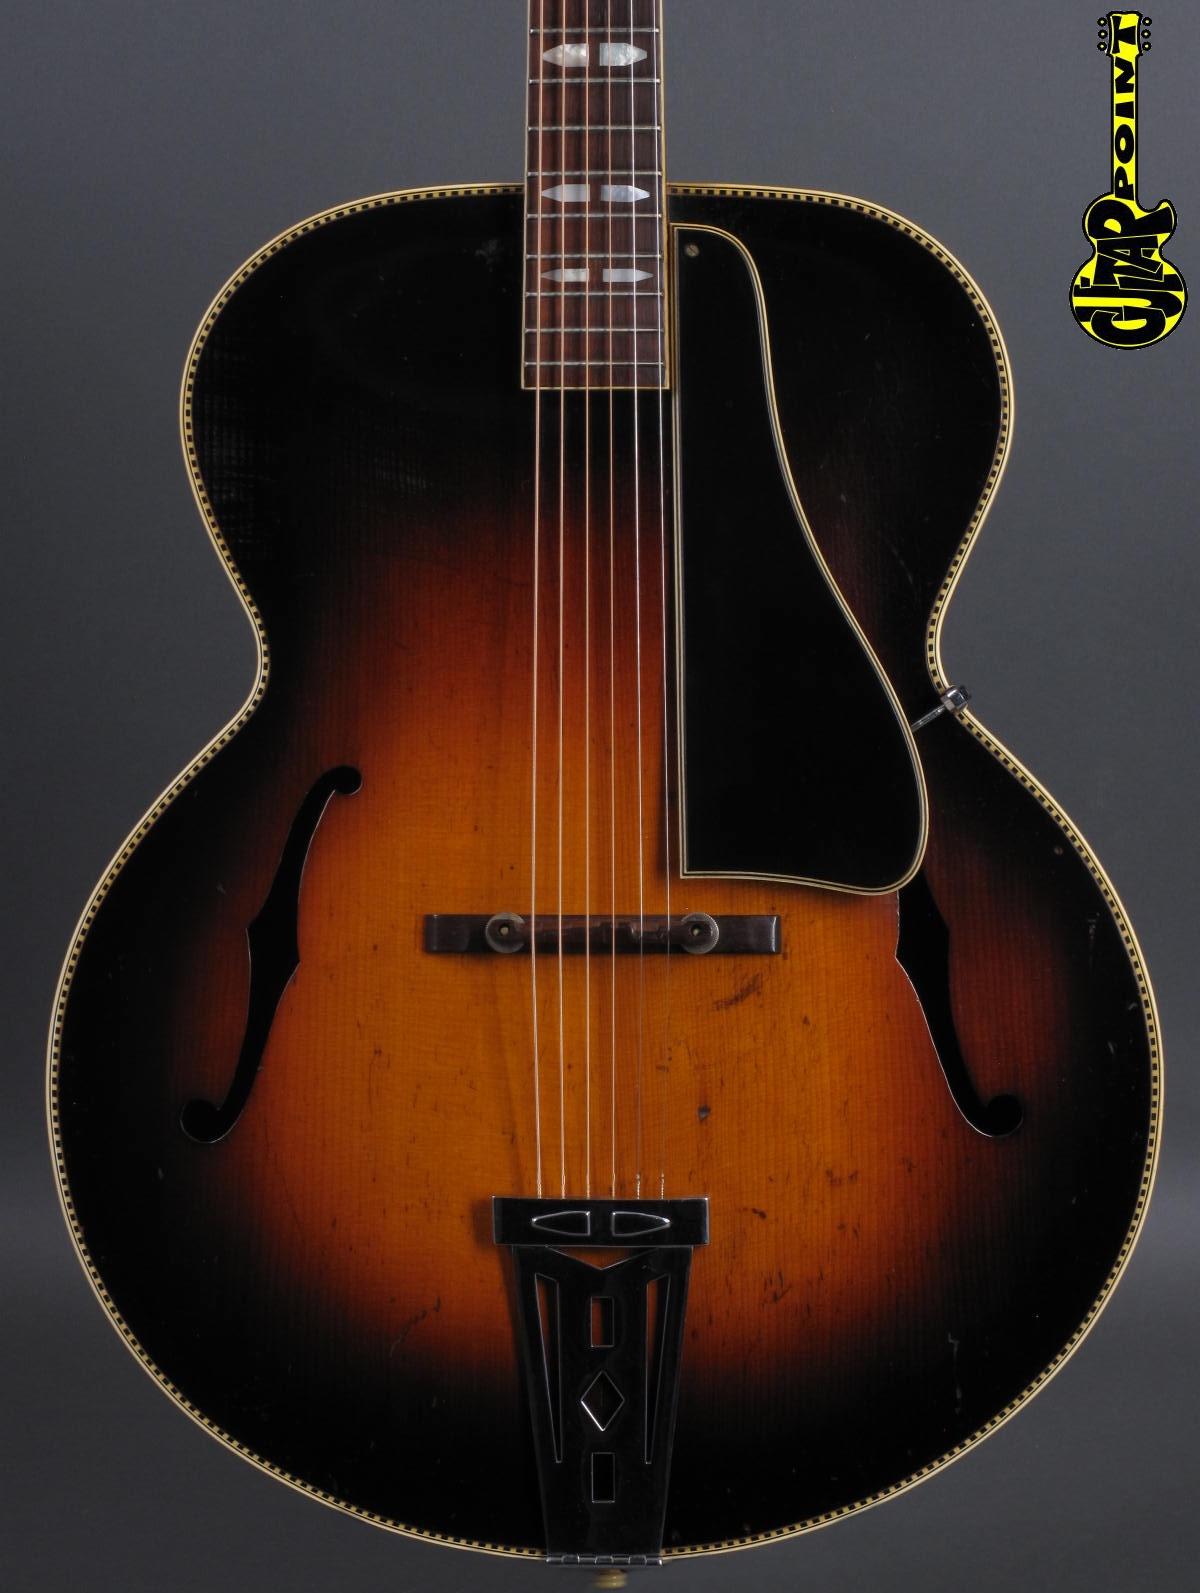 1939 Gibson L-10 - Sunburst